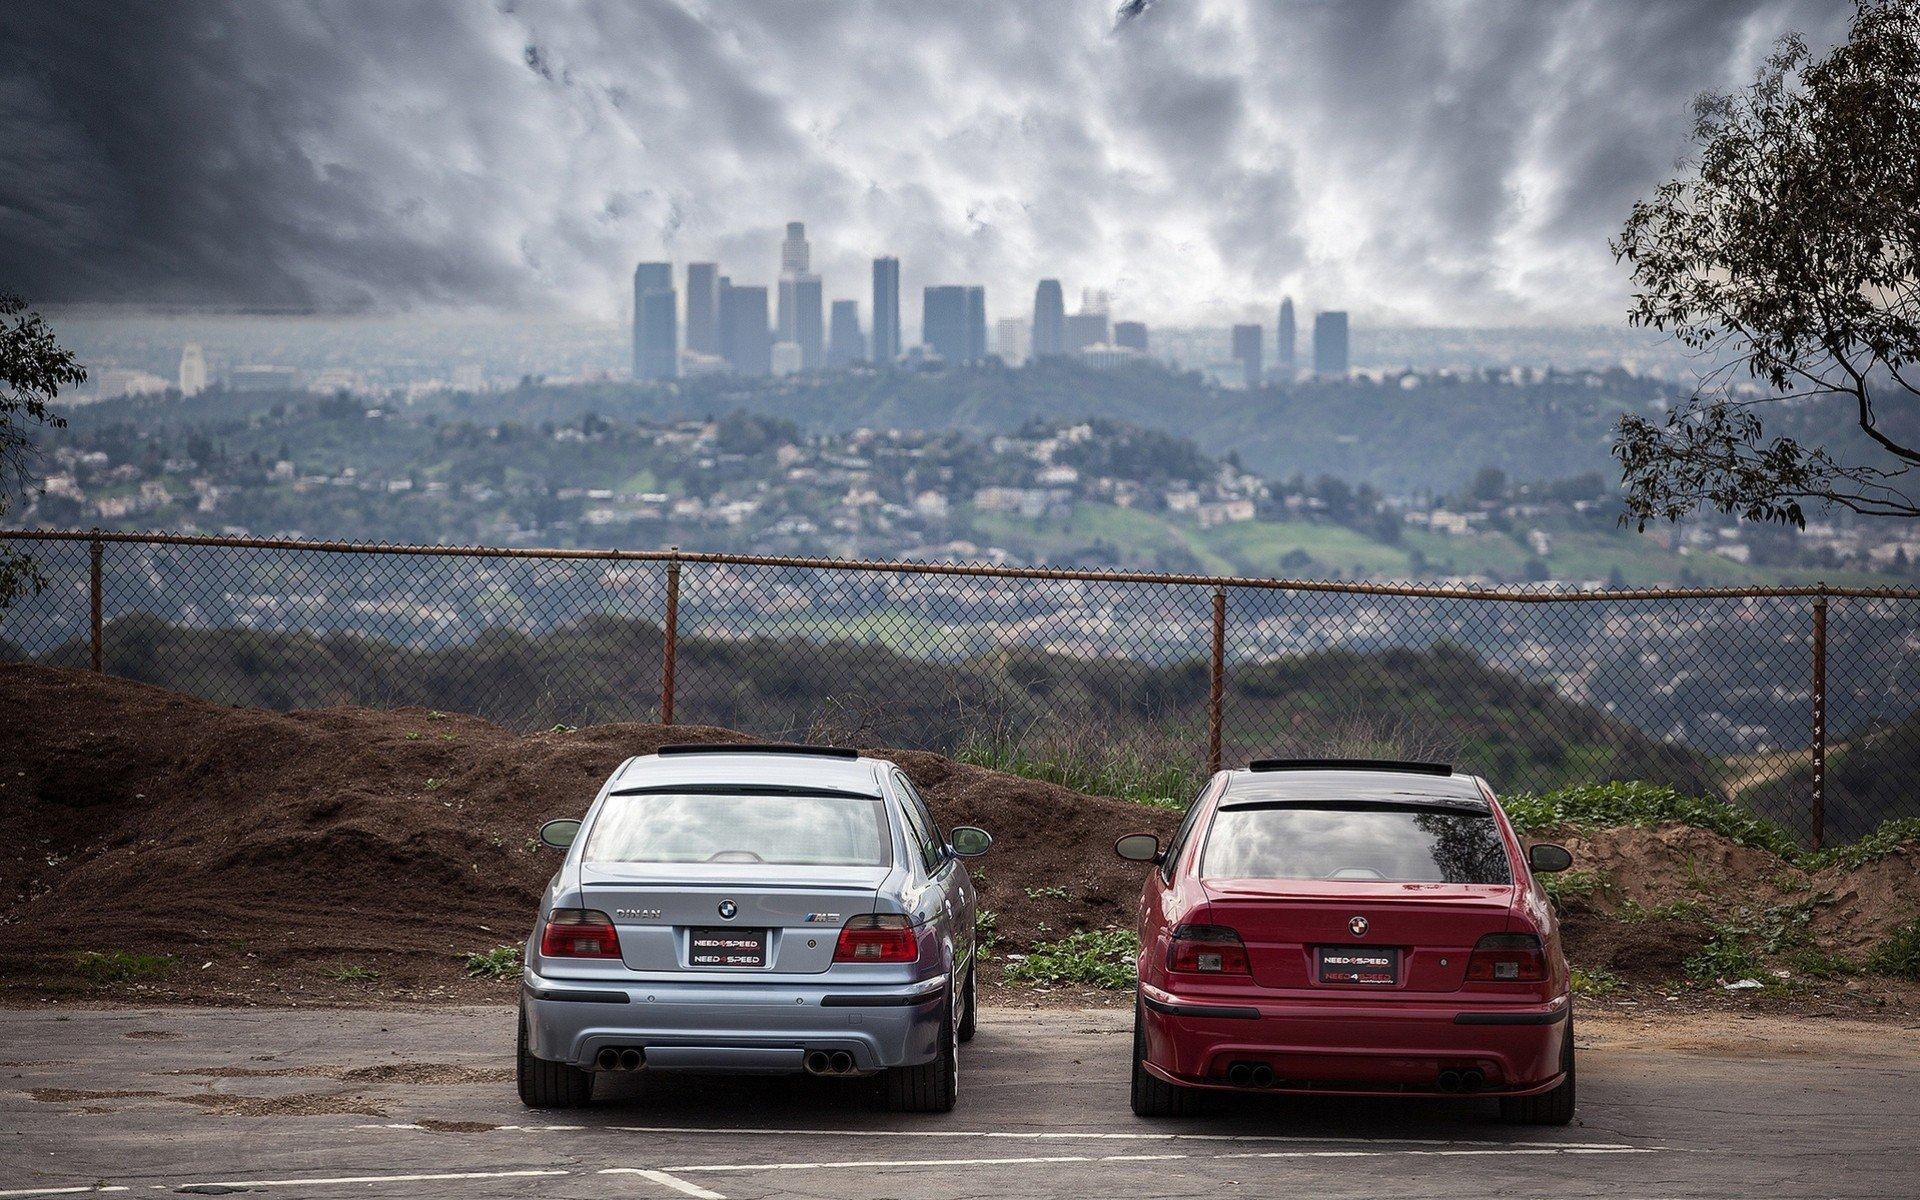 47+ BMW E39 M5 Wallpapers on WallpaperSafari